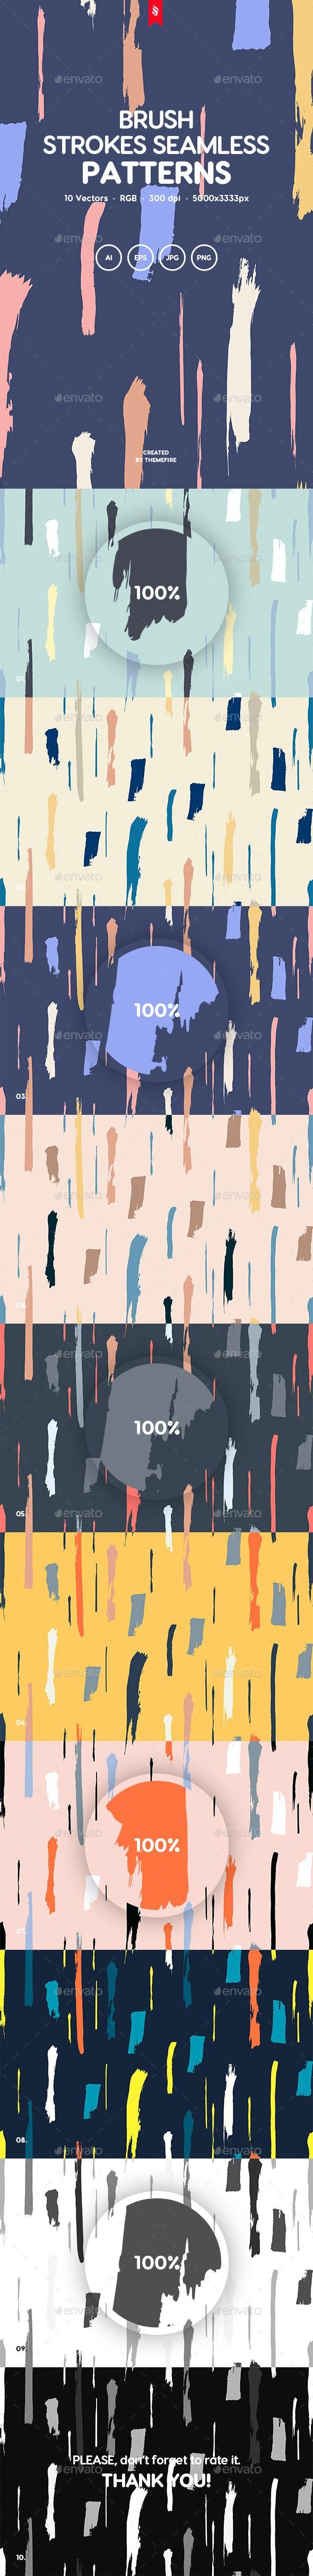 Brush Strokes Seamless Patterns - Patterns Backgrounds